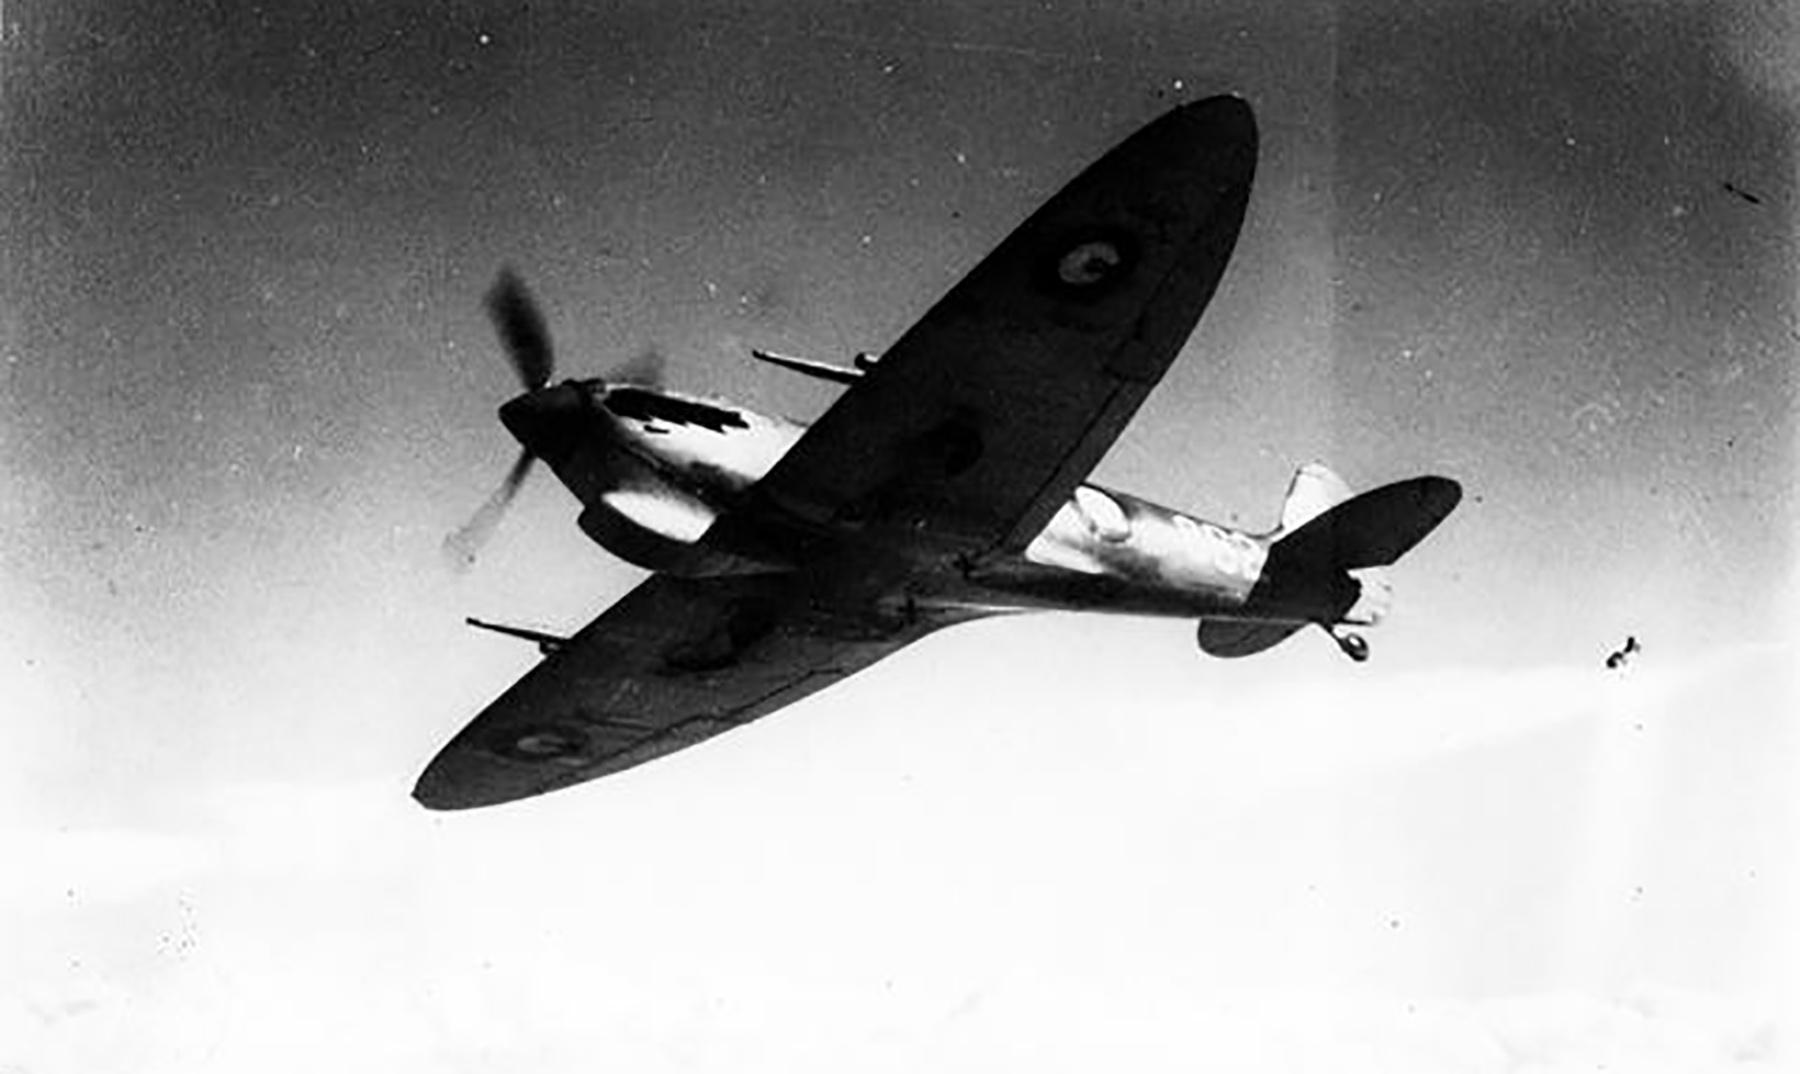 Spitfire MkVcTrop RAAF 2OTU 862 John Waddy LZ862 A58 217 Victoria 1943 02